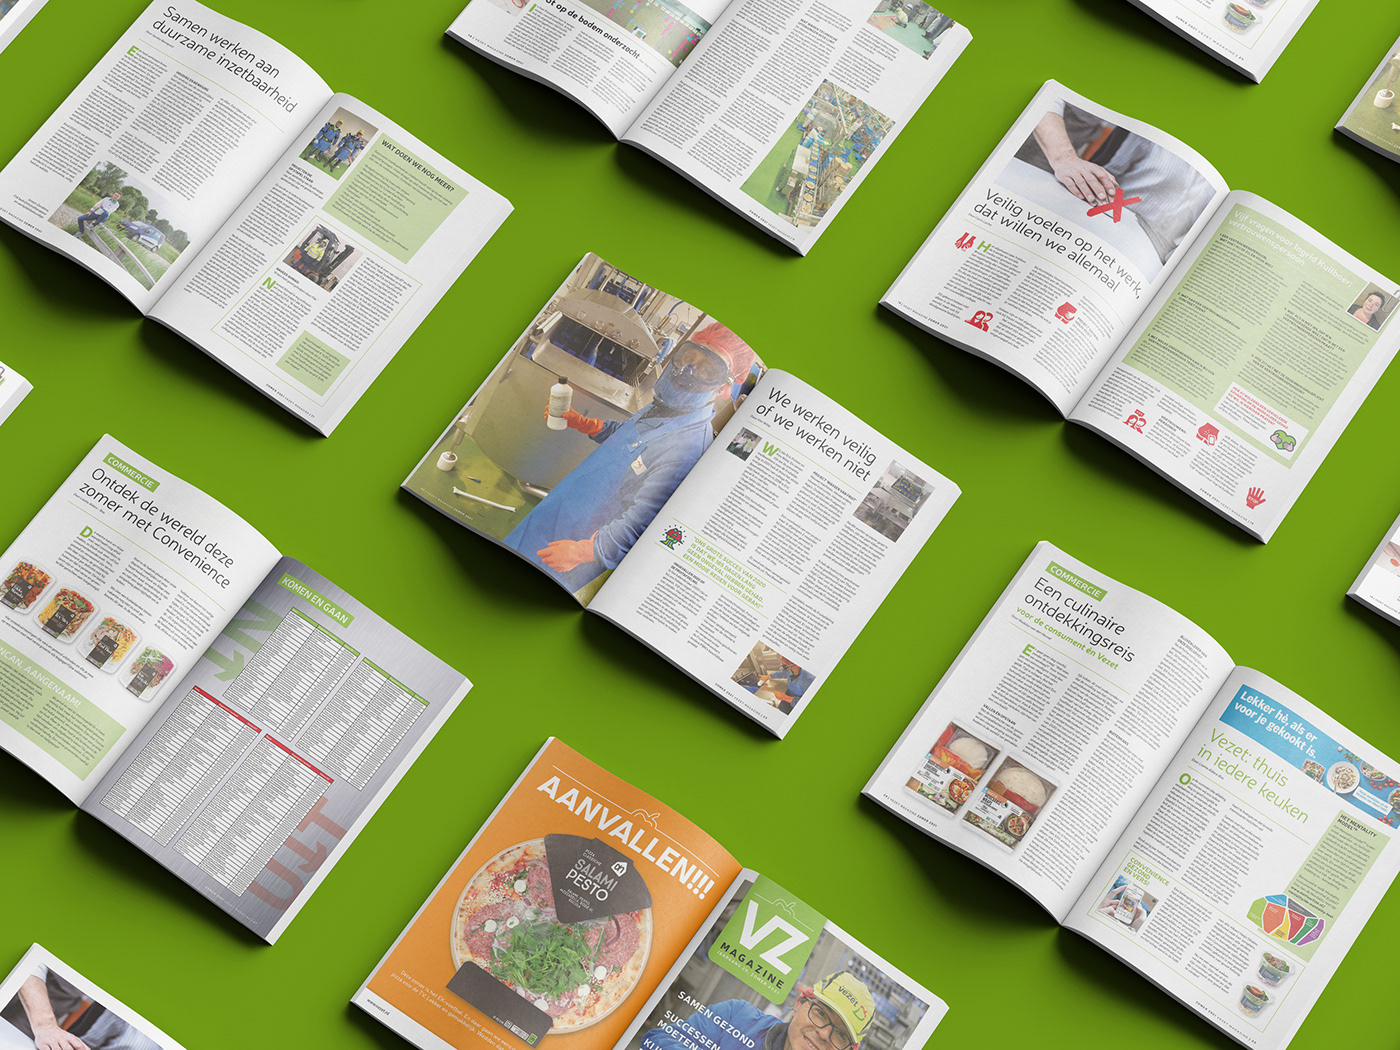 convenience employer branding Food  Fruit magazine vegetables